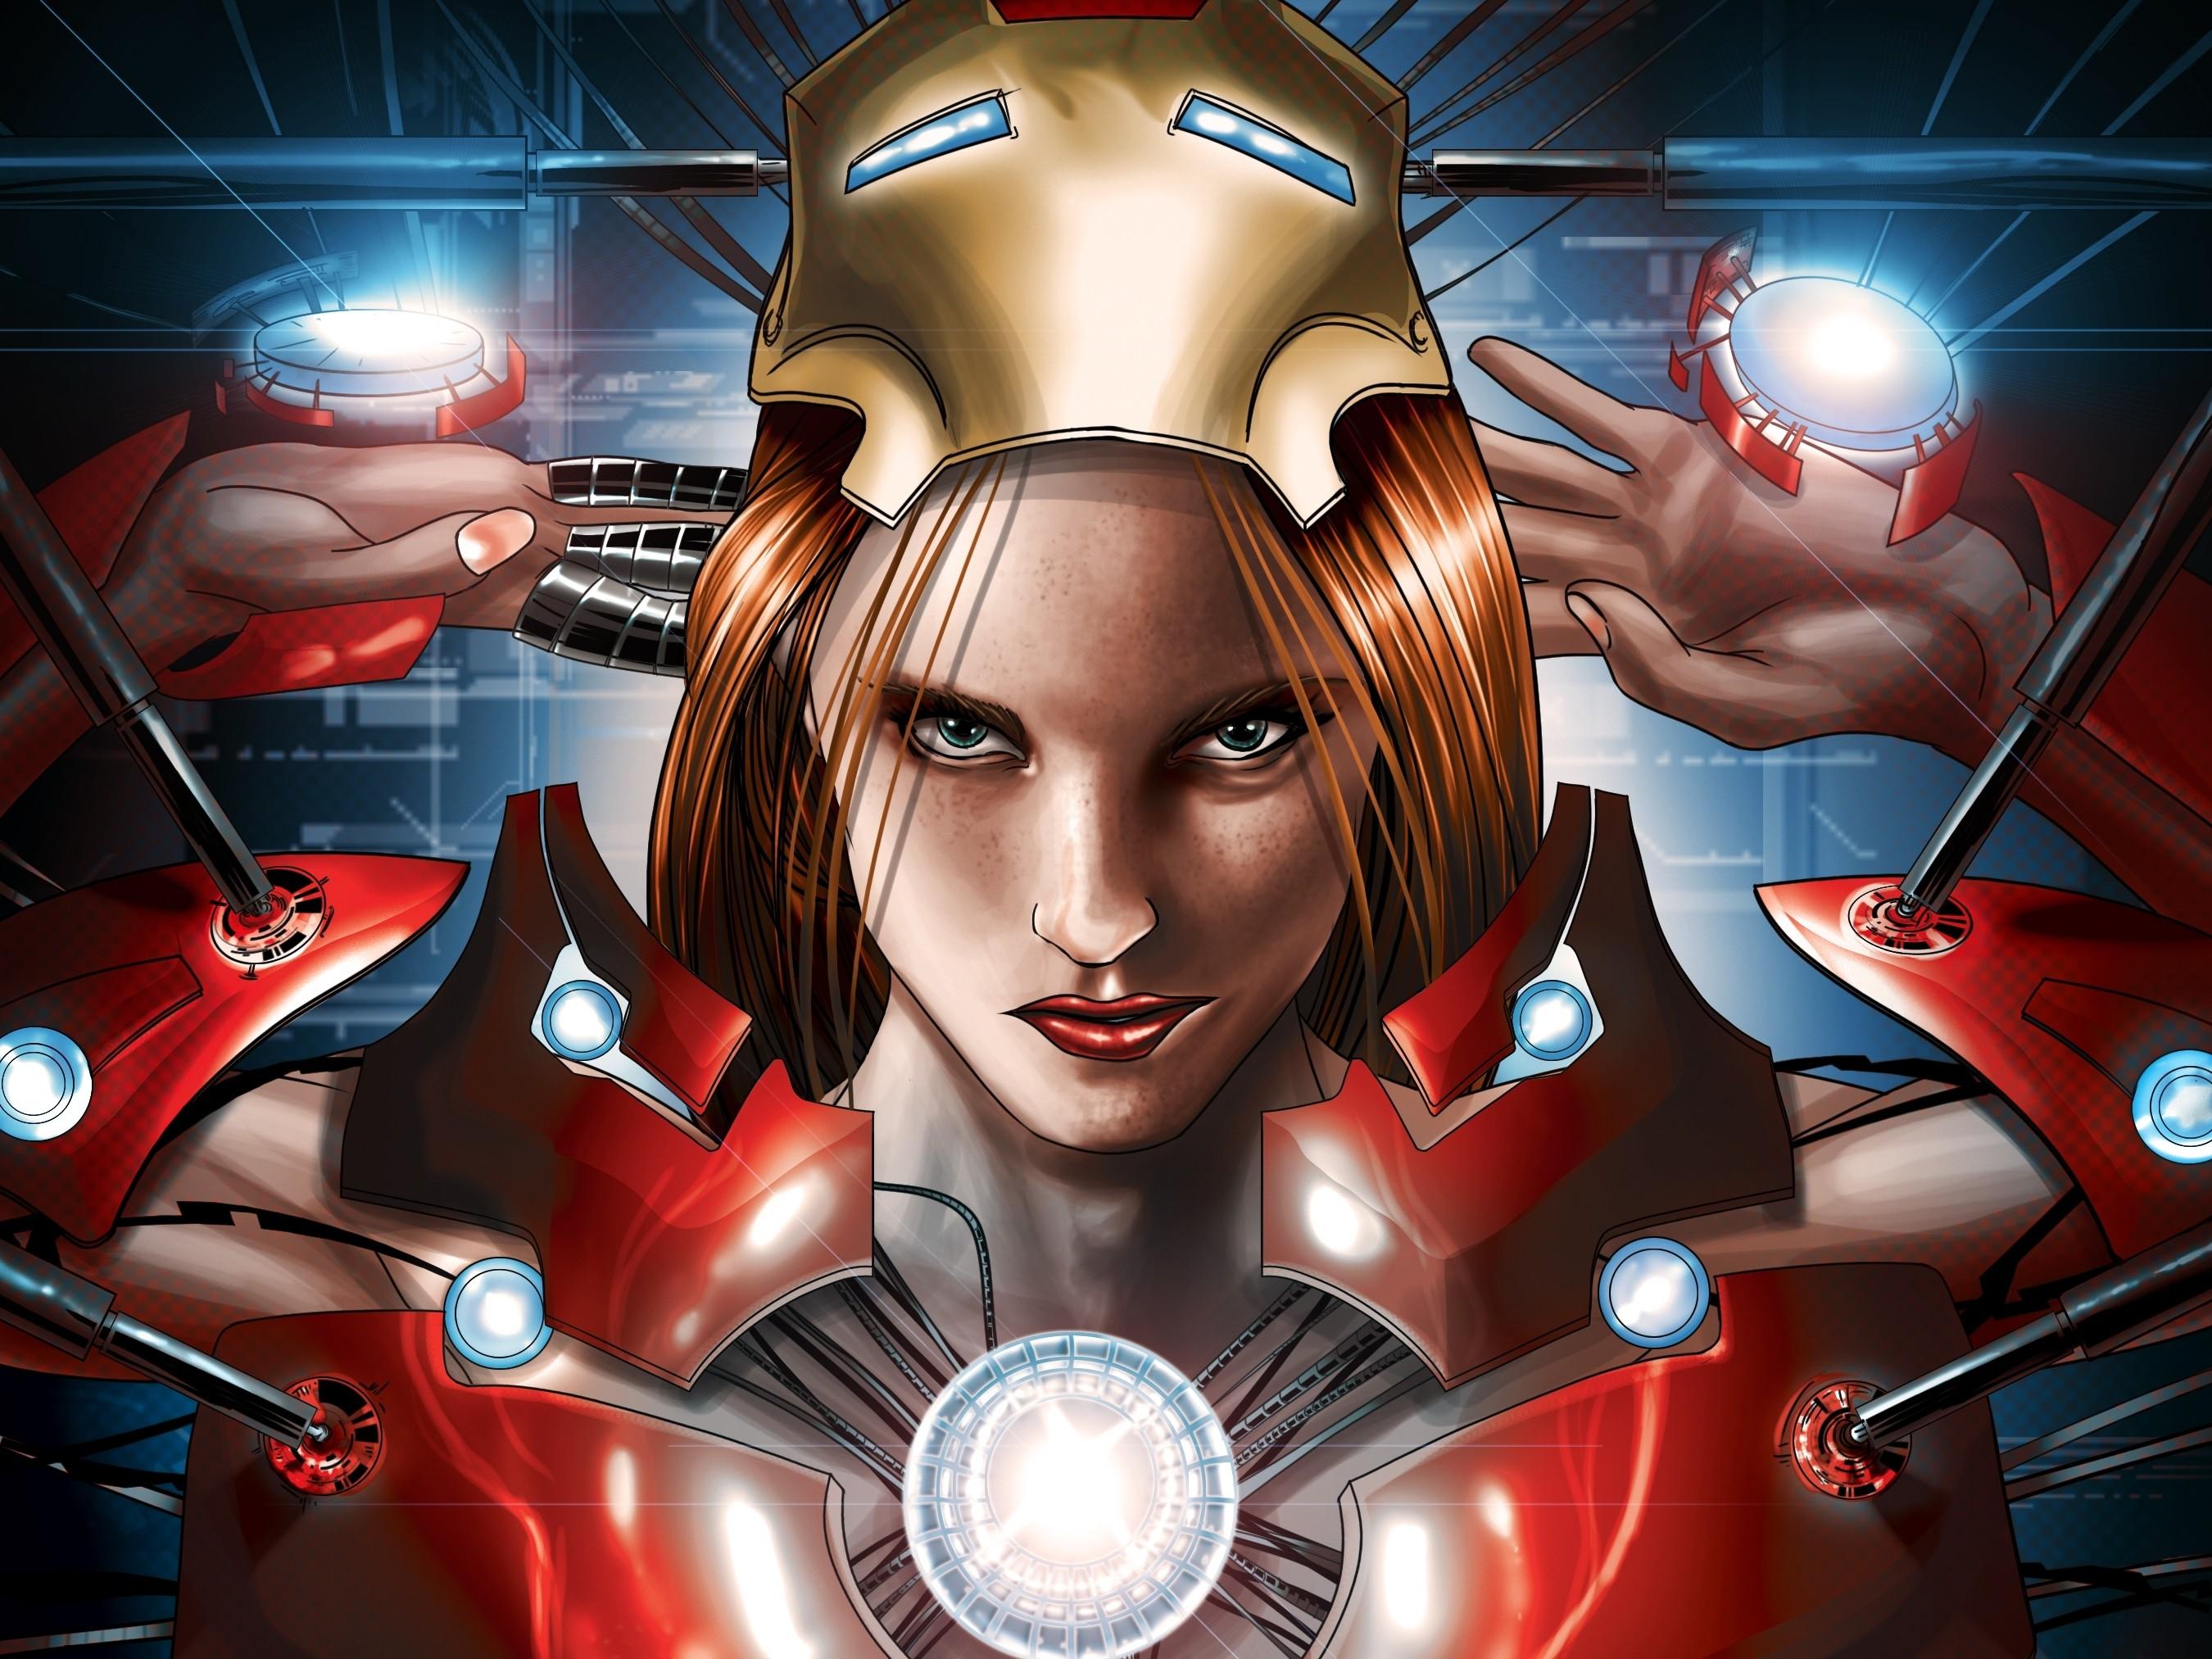 Fantastic Wallpaper Marvel Portrait - women-redhead-anime-superhero-Marvel-Comics-Iron-Man-machine-comics-Pepper-Potts-screenshot-computer-wallpaper-comic-book-50716  Collection_717782.jpg